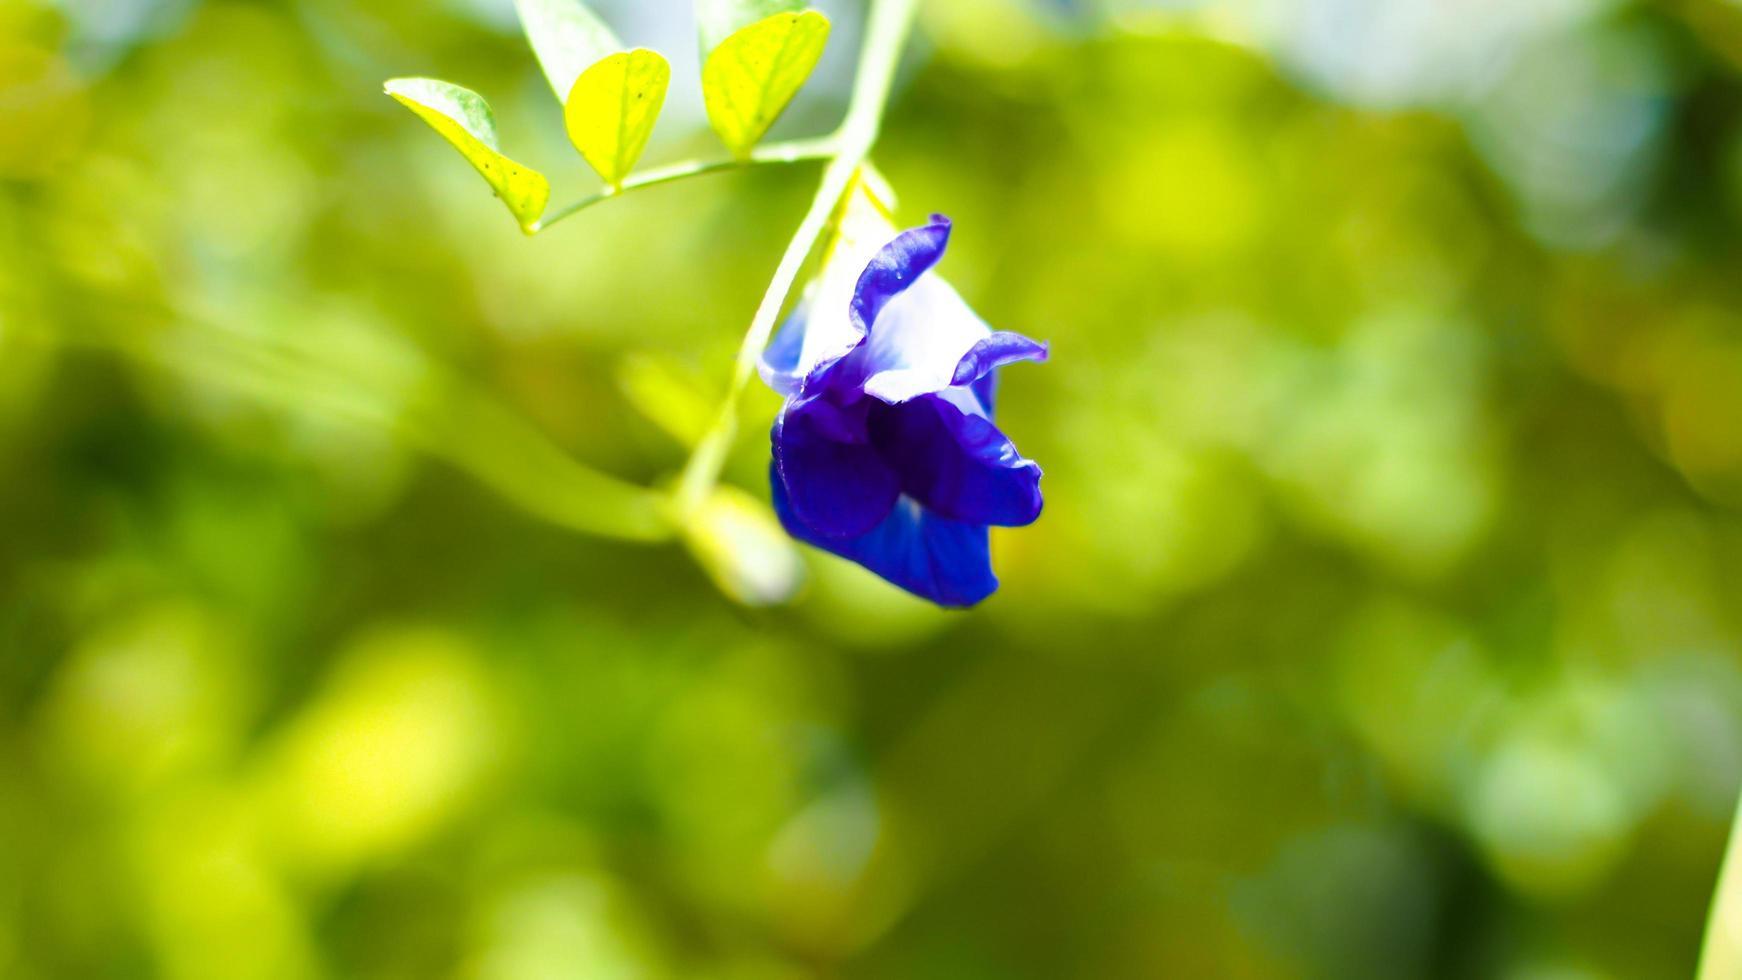 pigeonwings bluebellvine fleur de pois bleu photo